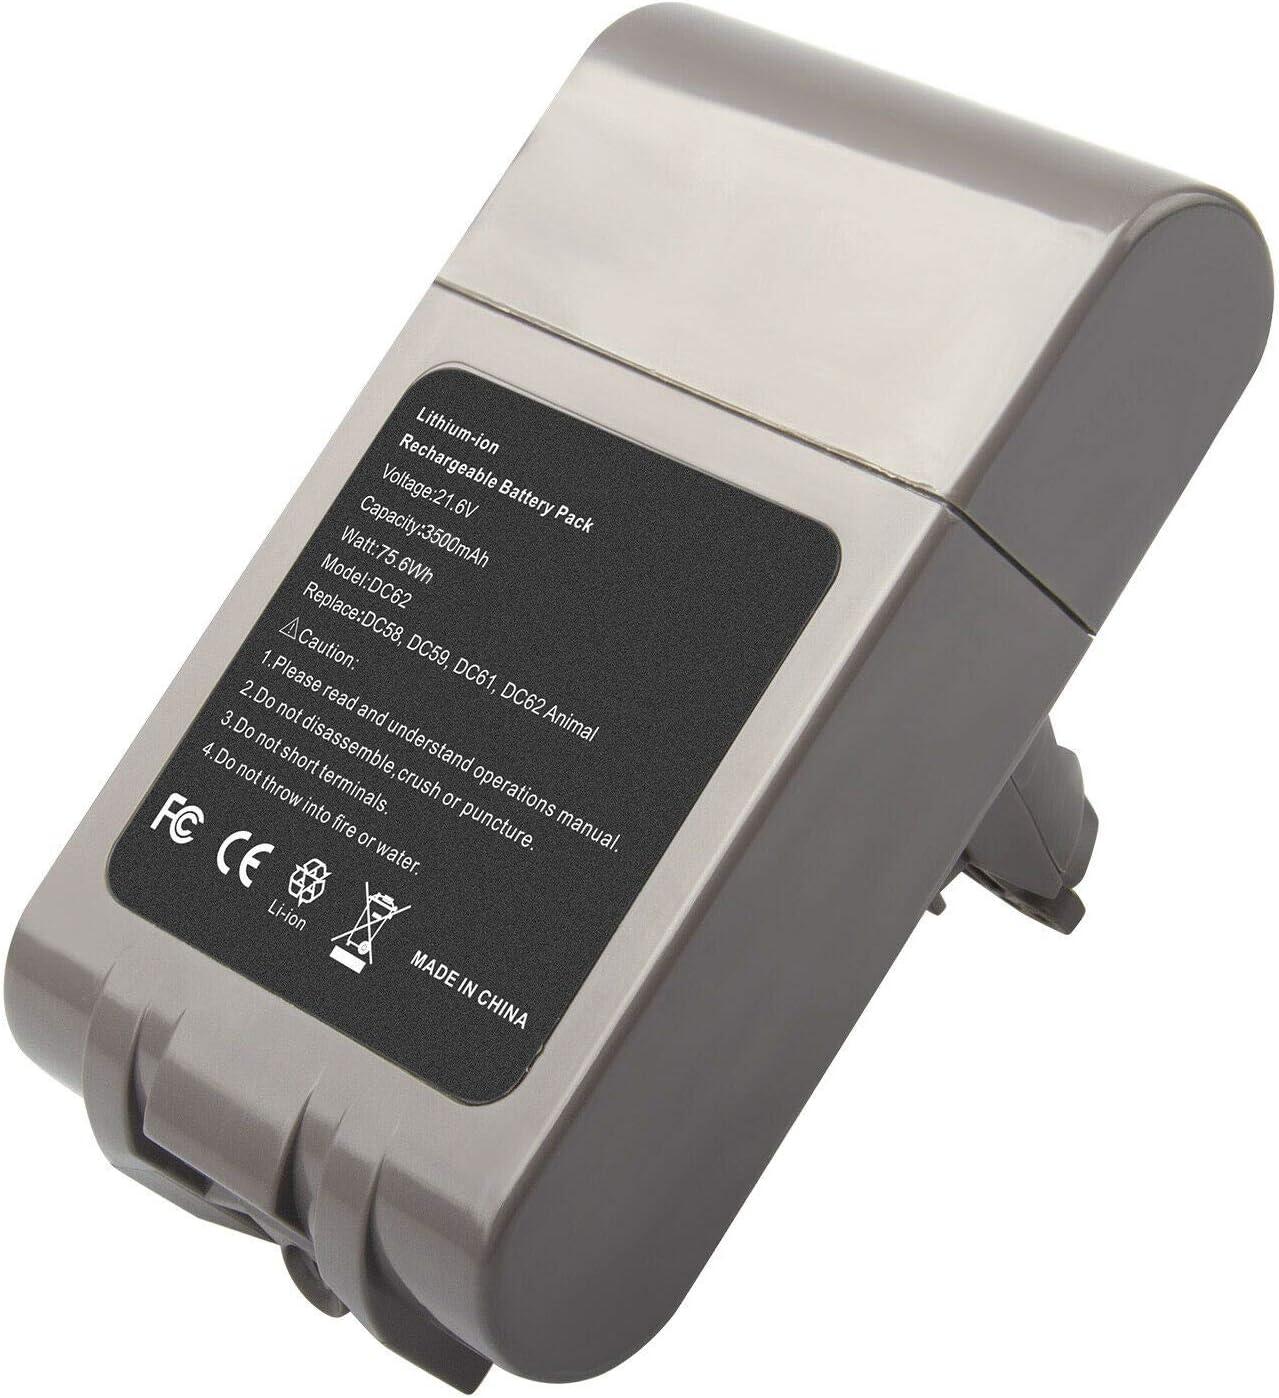 Vacuums & Floor Care Vacuum Parts & Accessories ghdonat.com 3.5Ah ...